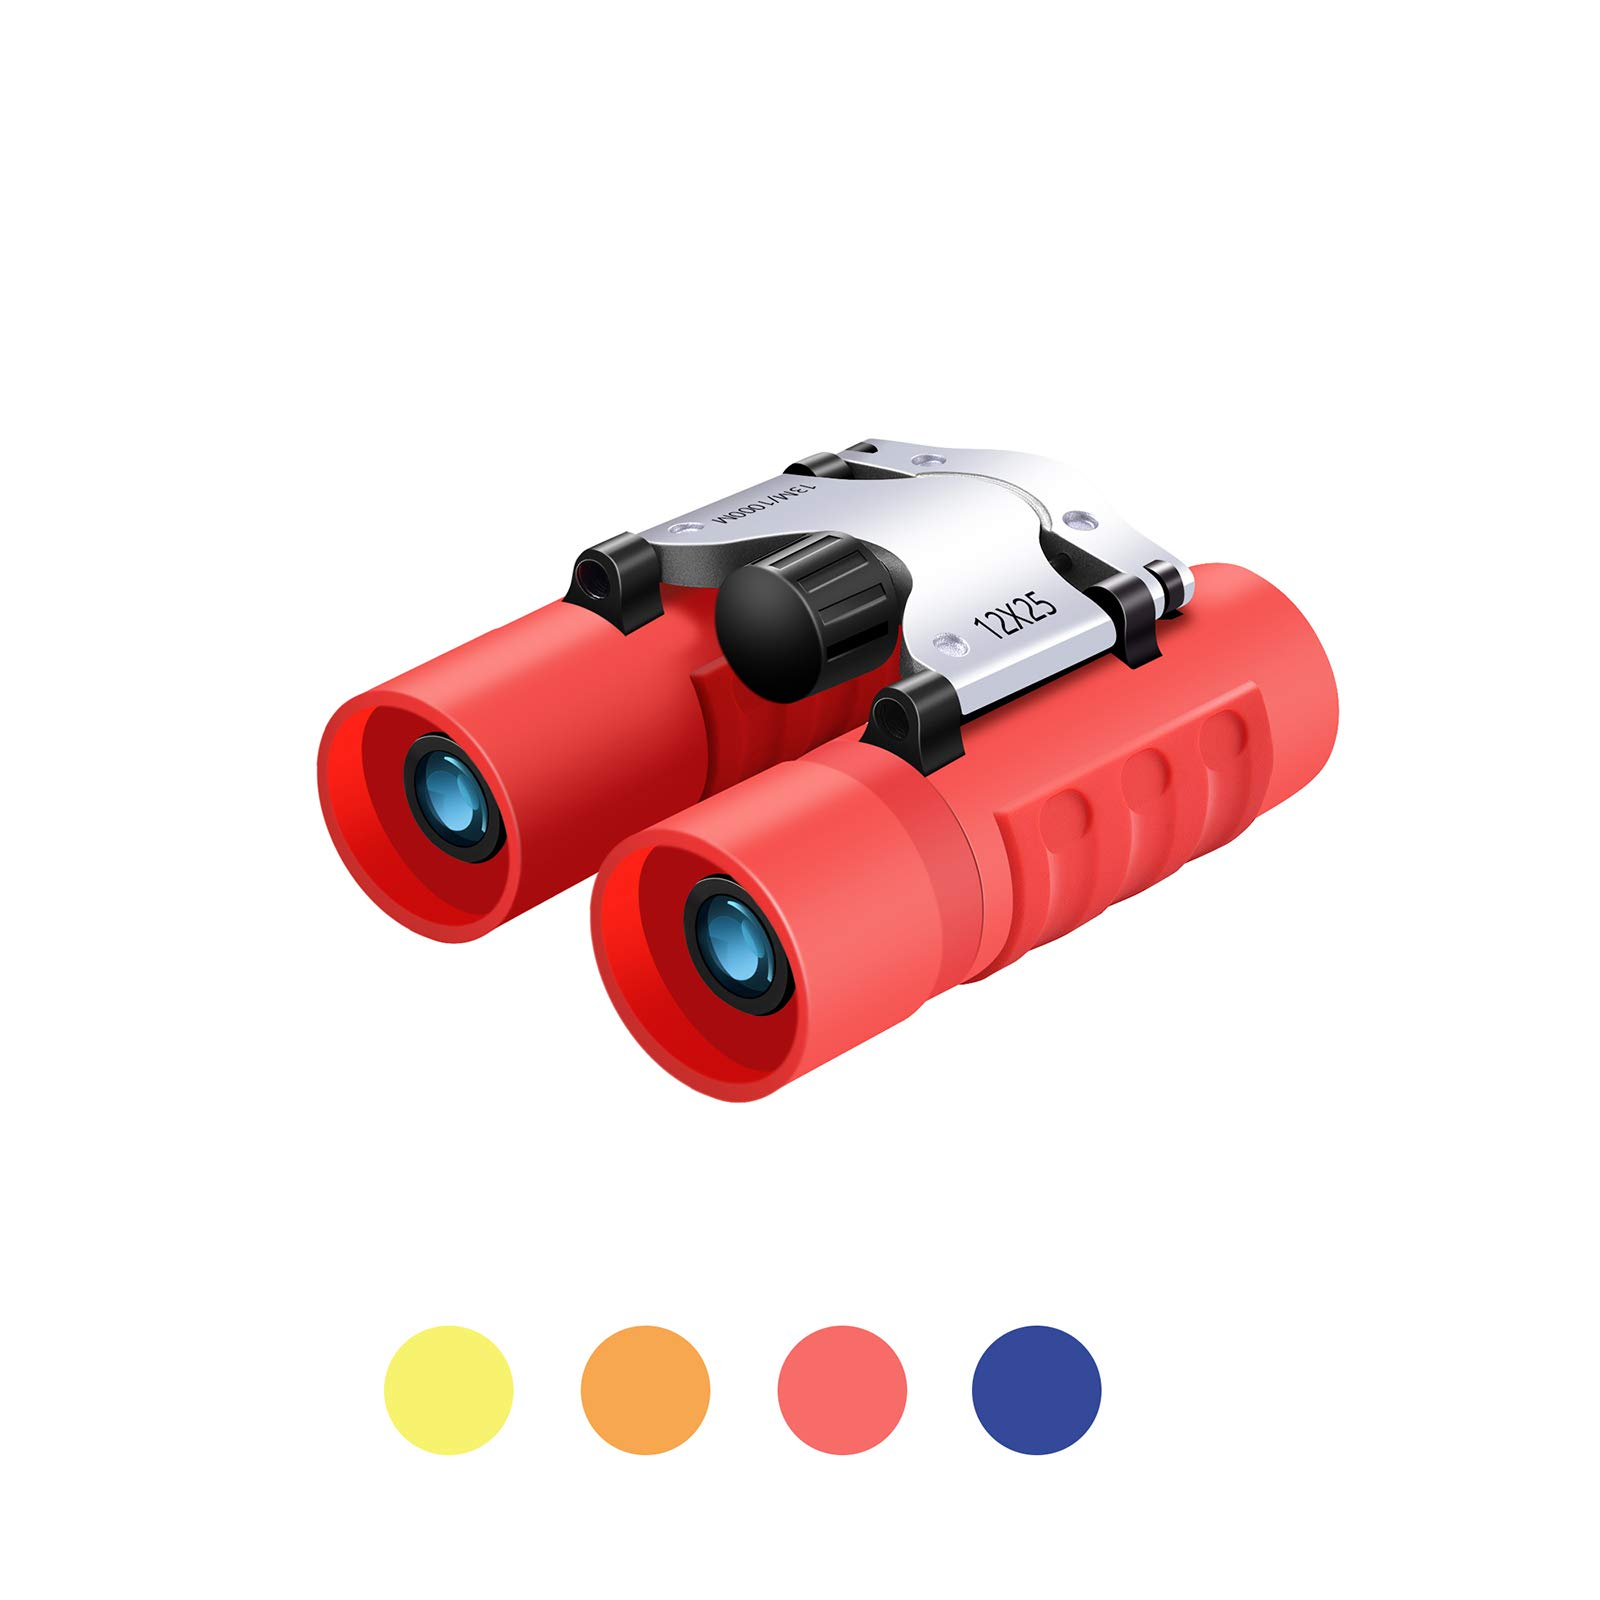 Binoculars for Kids, 12X25 Samll Lightweight Pocket Binoculars High Power Real Optics for Safari Concert Opera Theater 3-12 Years Boys Girls Best Gifts (Red)